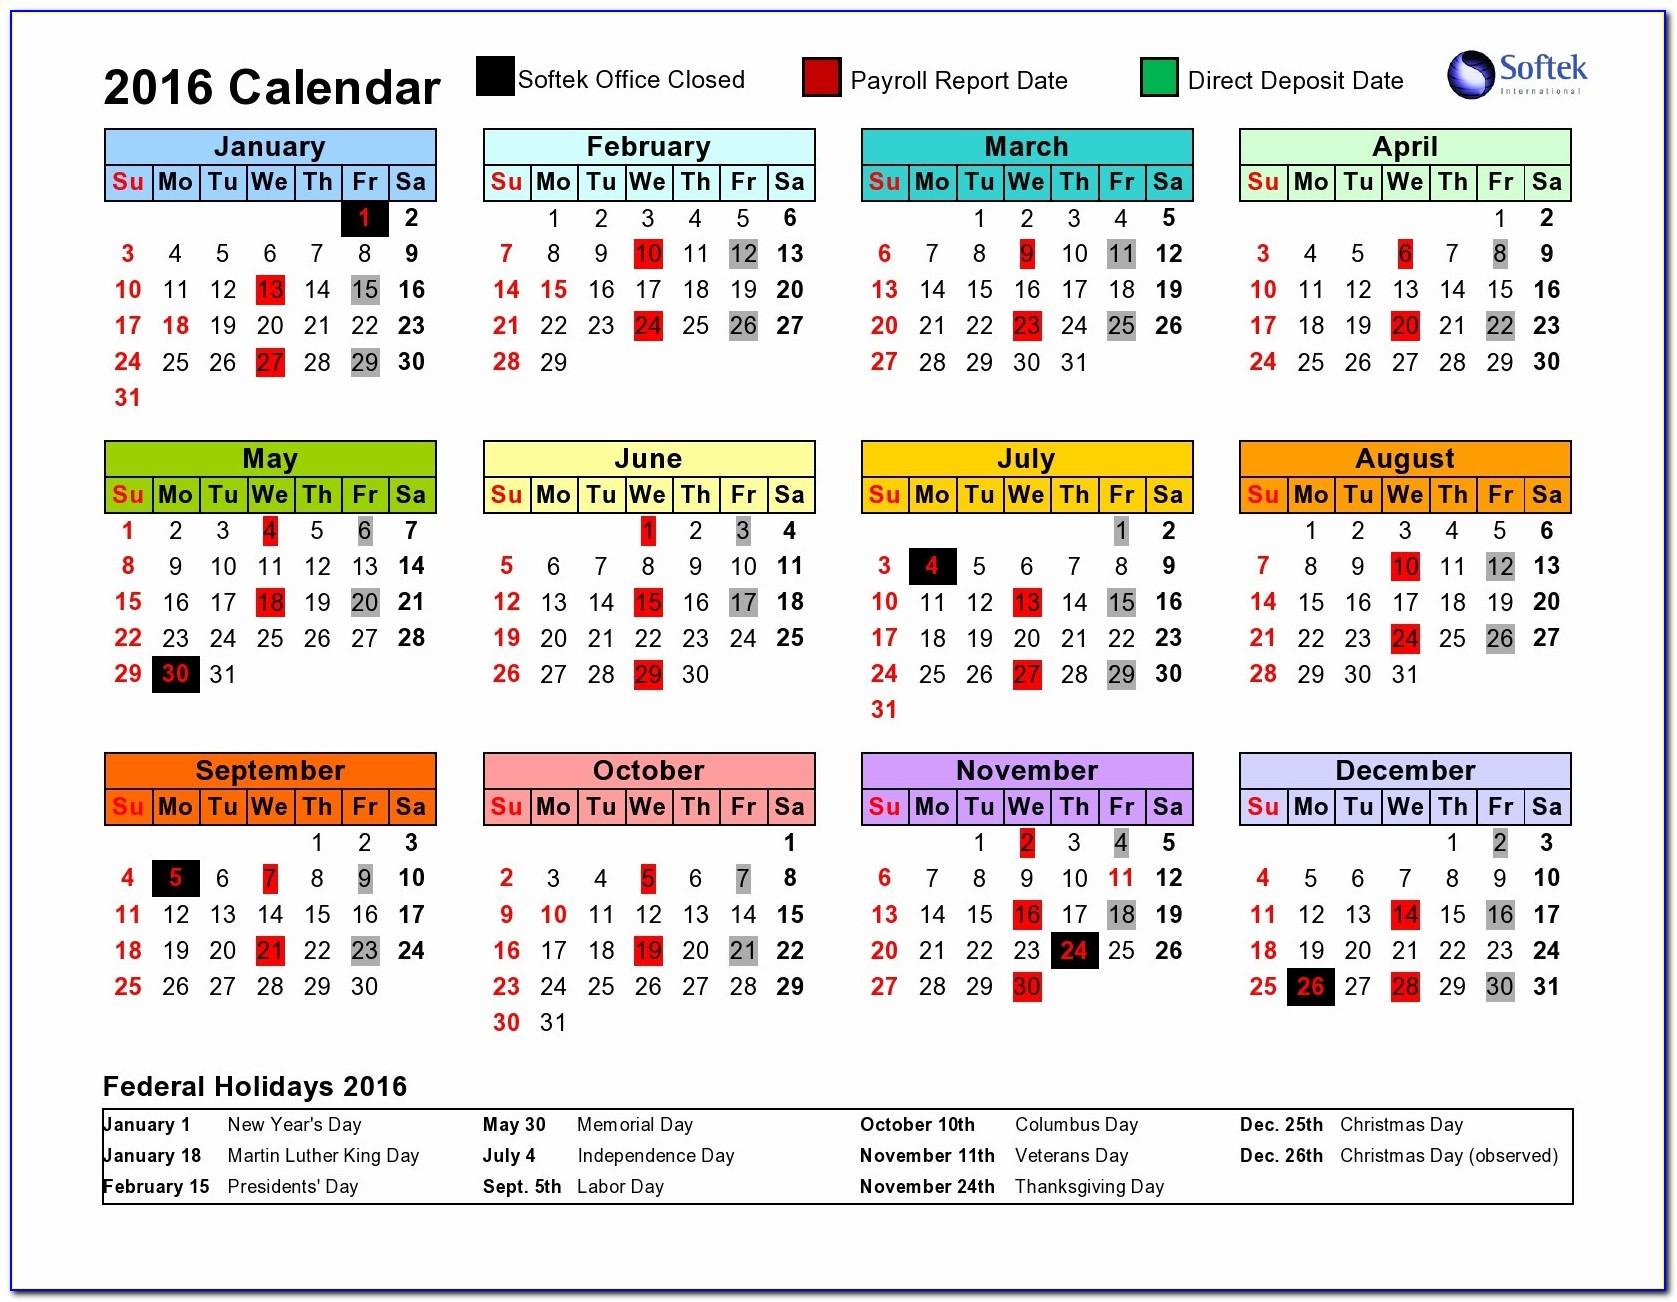 2017 Weekly Payroll Calendar Template